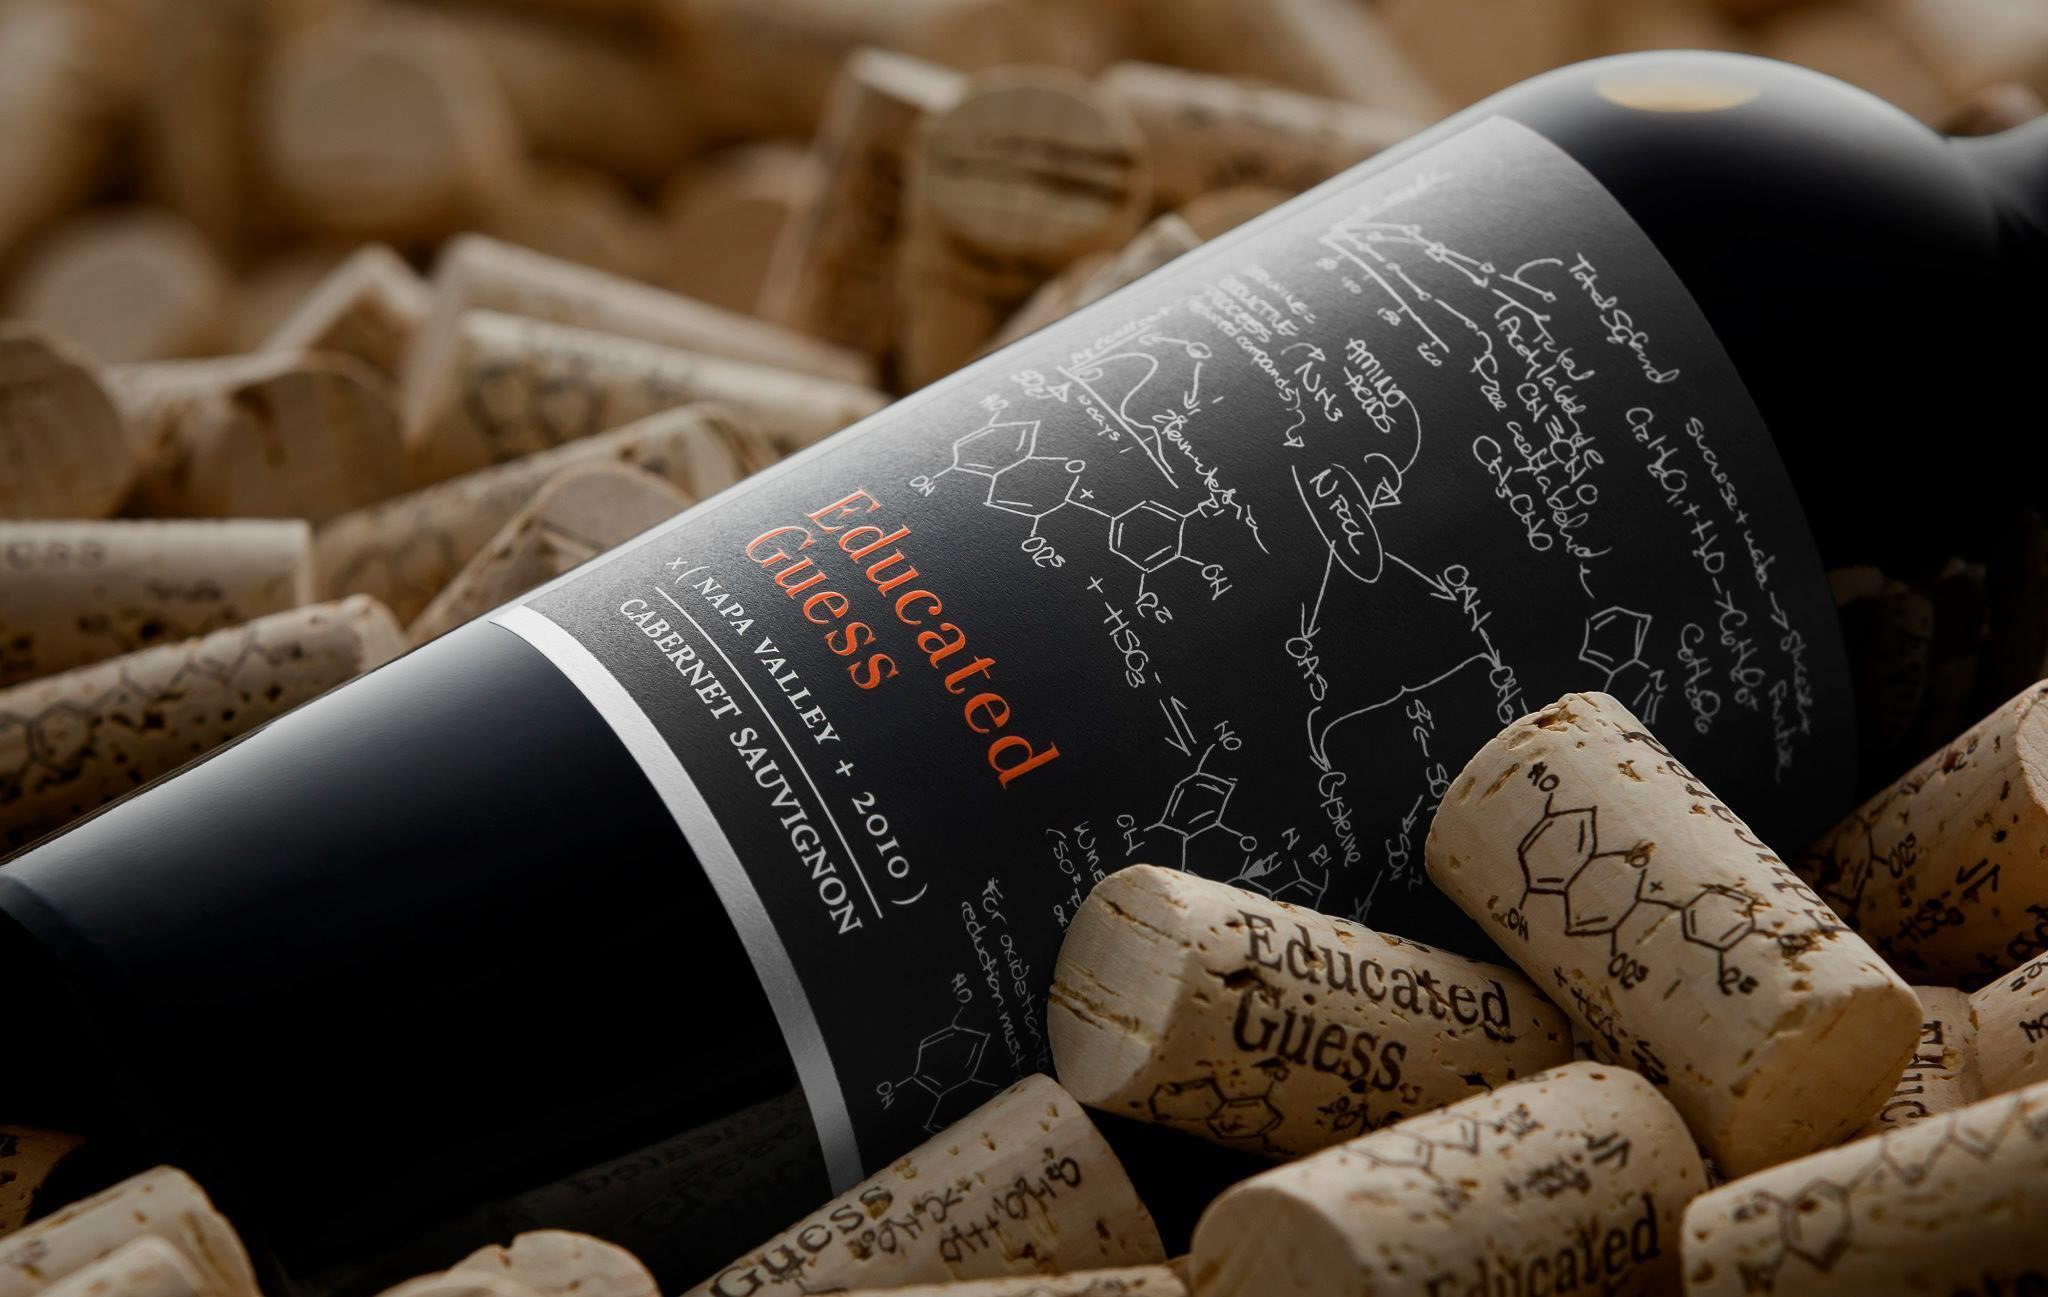 Roots Run Deep Winery image 3